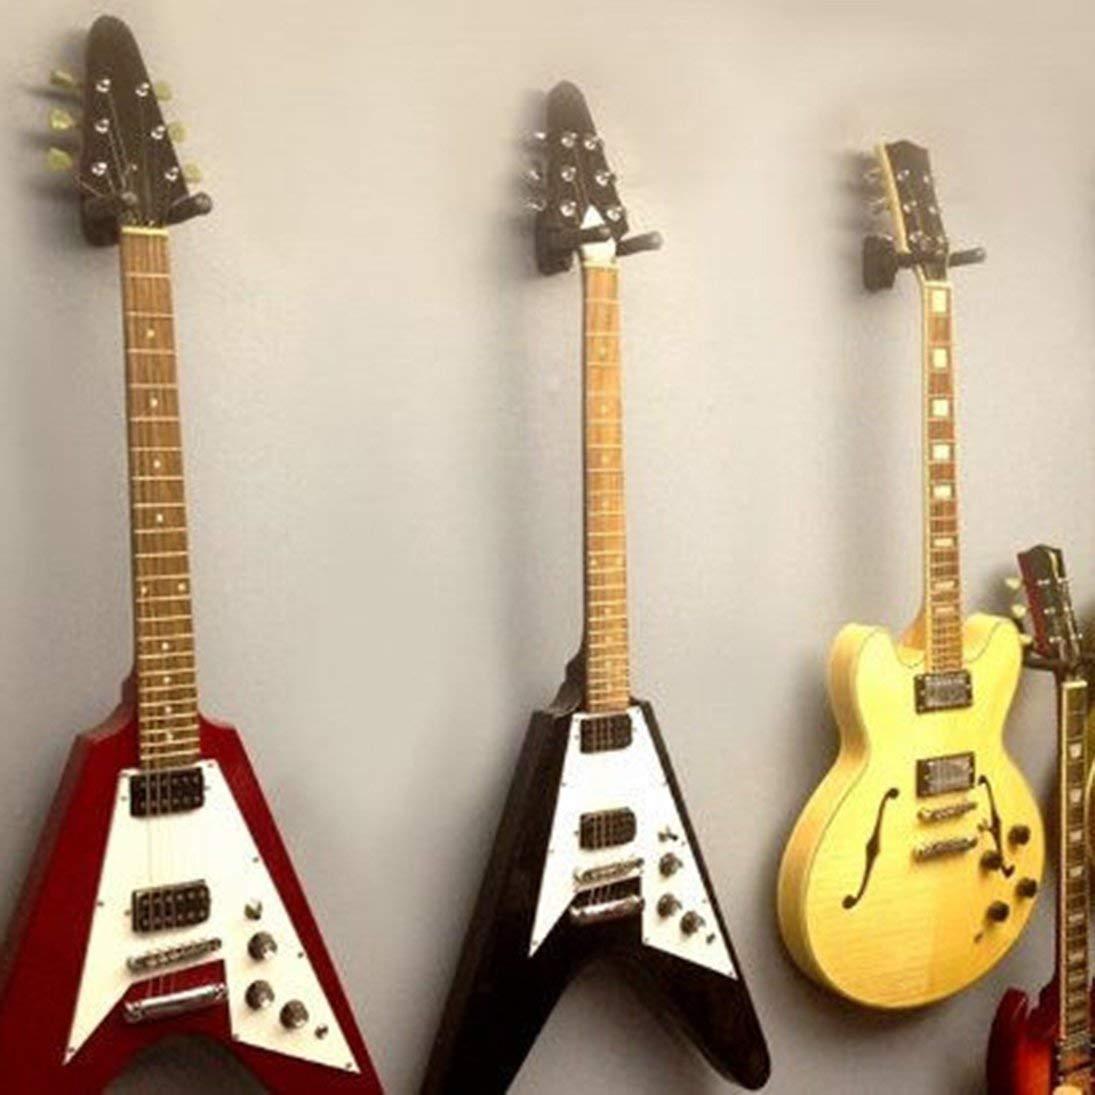 Mandolin Banjo Baynne-CAa2 Guitar Hanger Hook Holder Wall Mount Guitars Bass,Ukulele